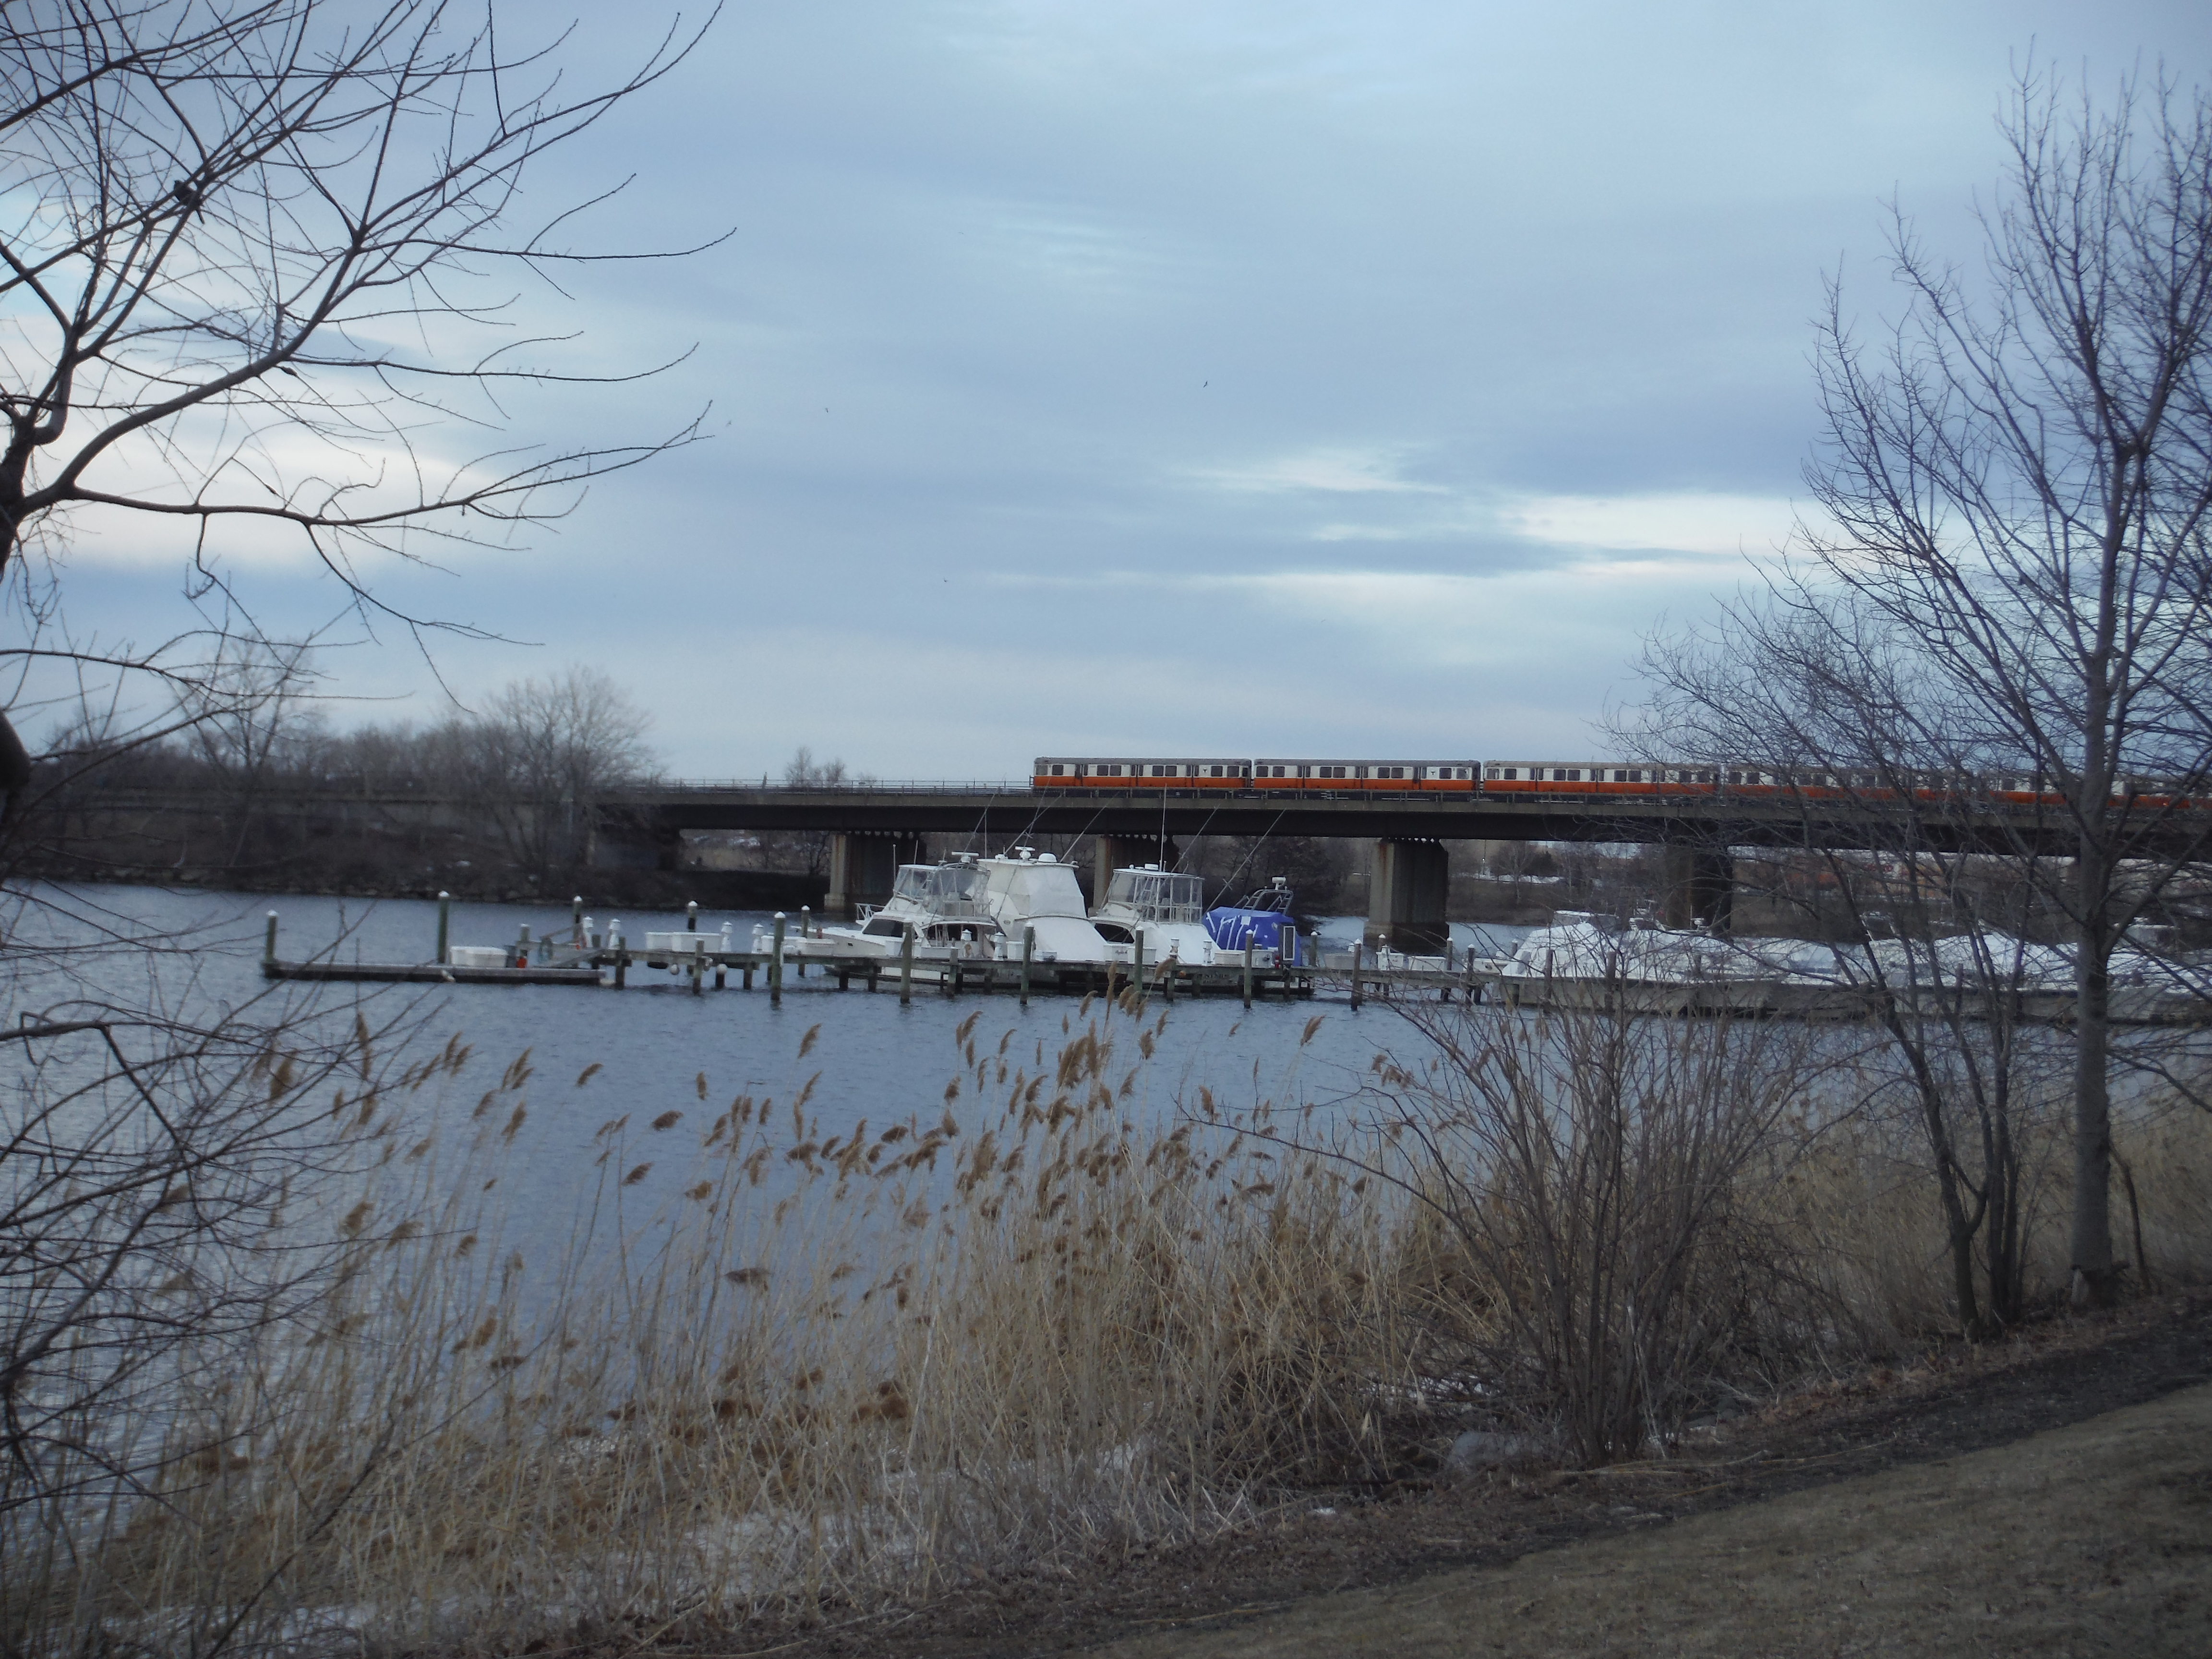 Exploring Massachusetts: March 2015